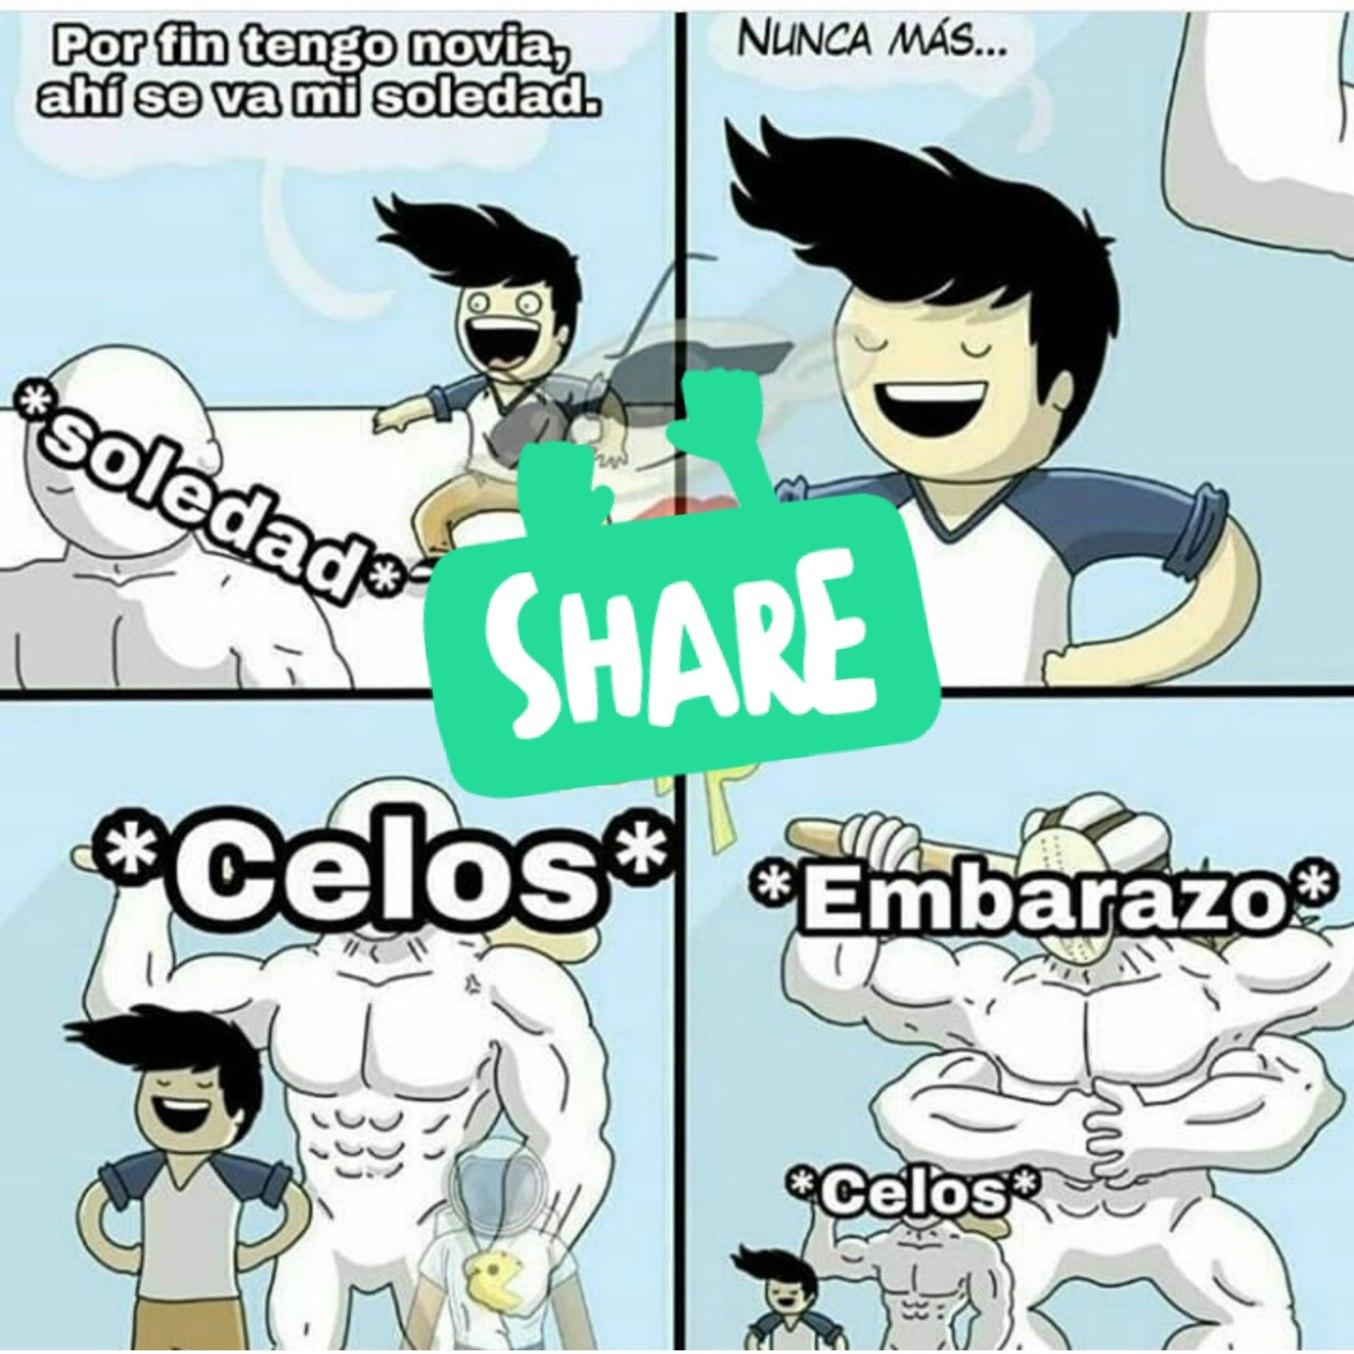 Share - meme